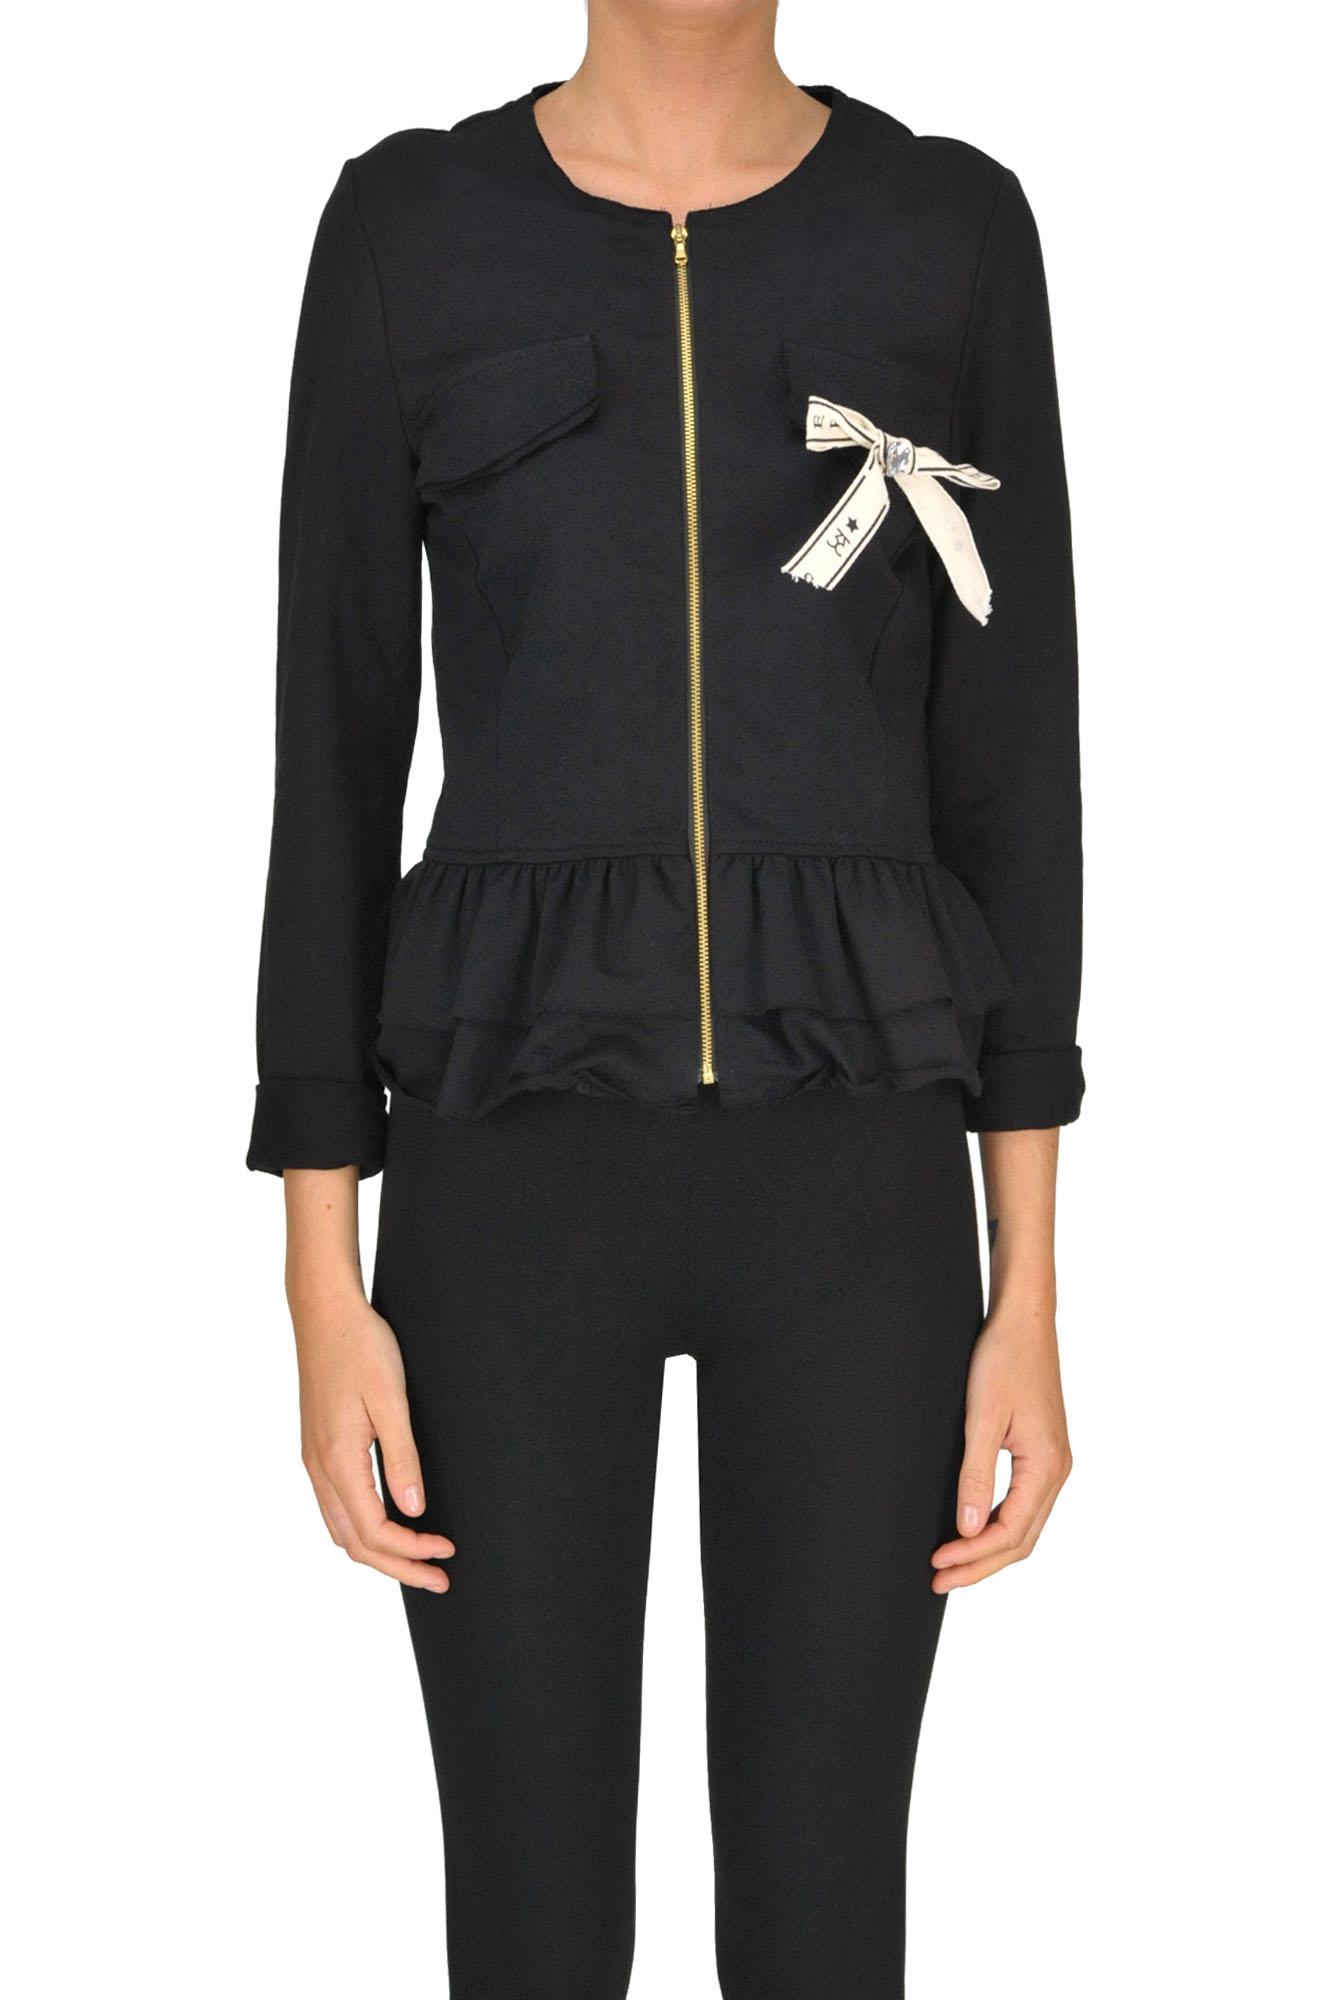 SWEET MATILDA Fleece Jacket in Black